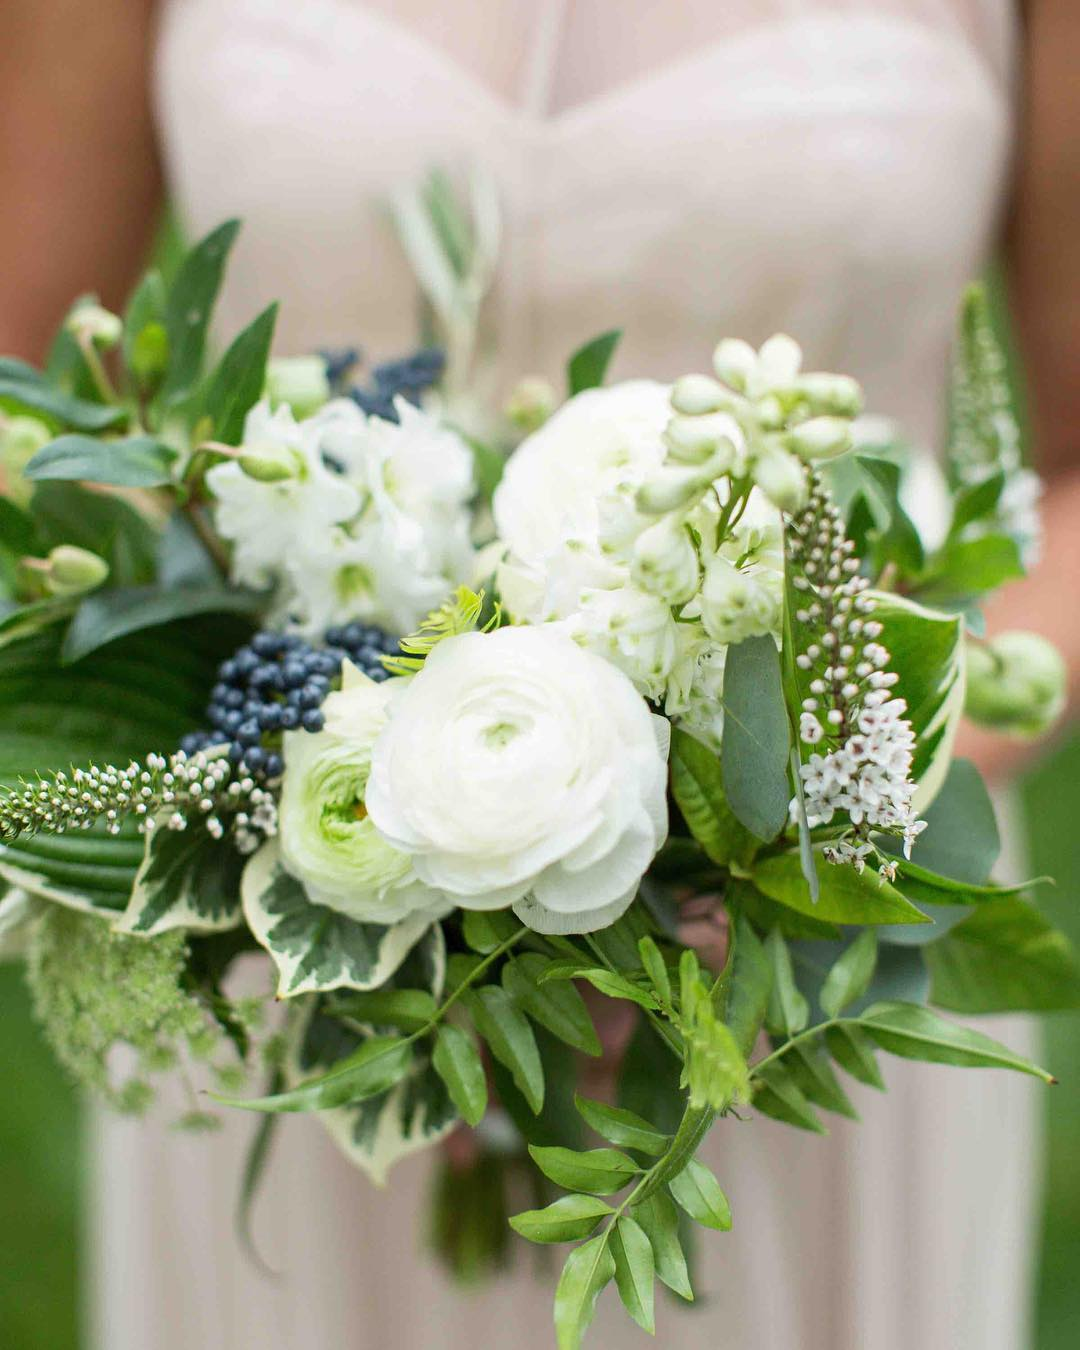 {loveliness} photo | @erikafollansbee  coordination | @nhwedplanner . . #hergirl #bridesmaids #bouquet #lovely #neutrals #greenery #rustic #woodland #romantic #nhwedding #lakeside #lakesregion #prettyflowers  #lotusfloraldesigns #weddingflowers #natural